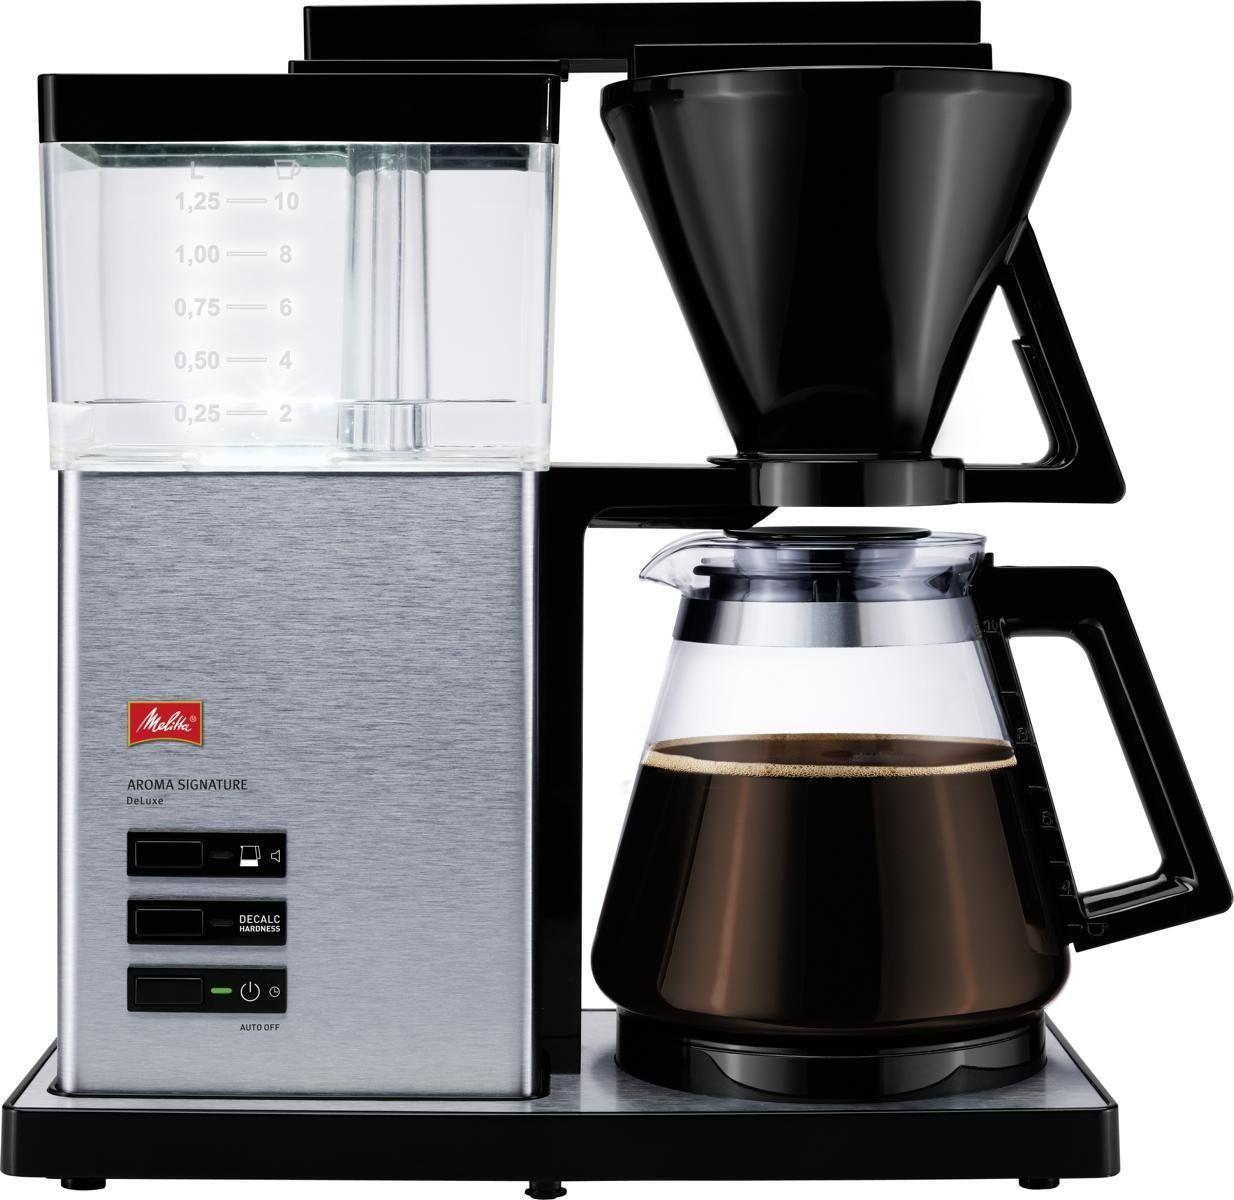 Melitta Aroma Signature Deluxe Coffee Filter Machine